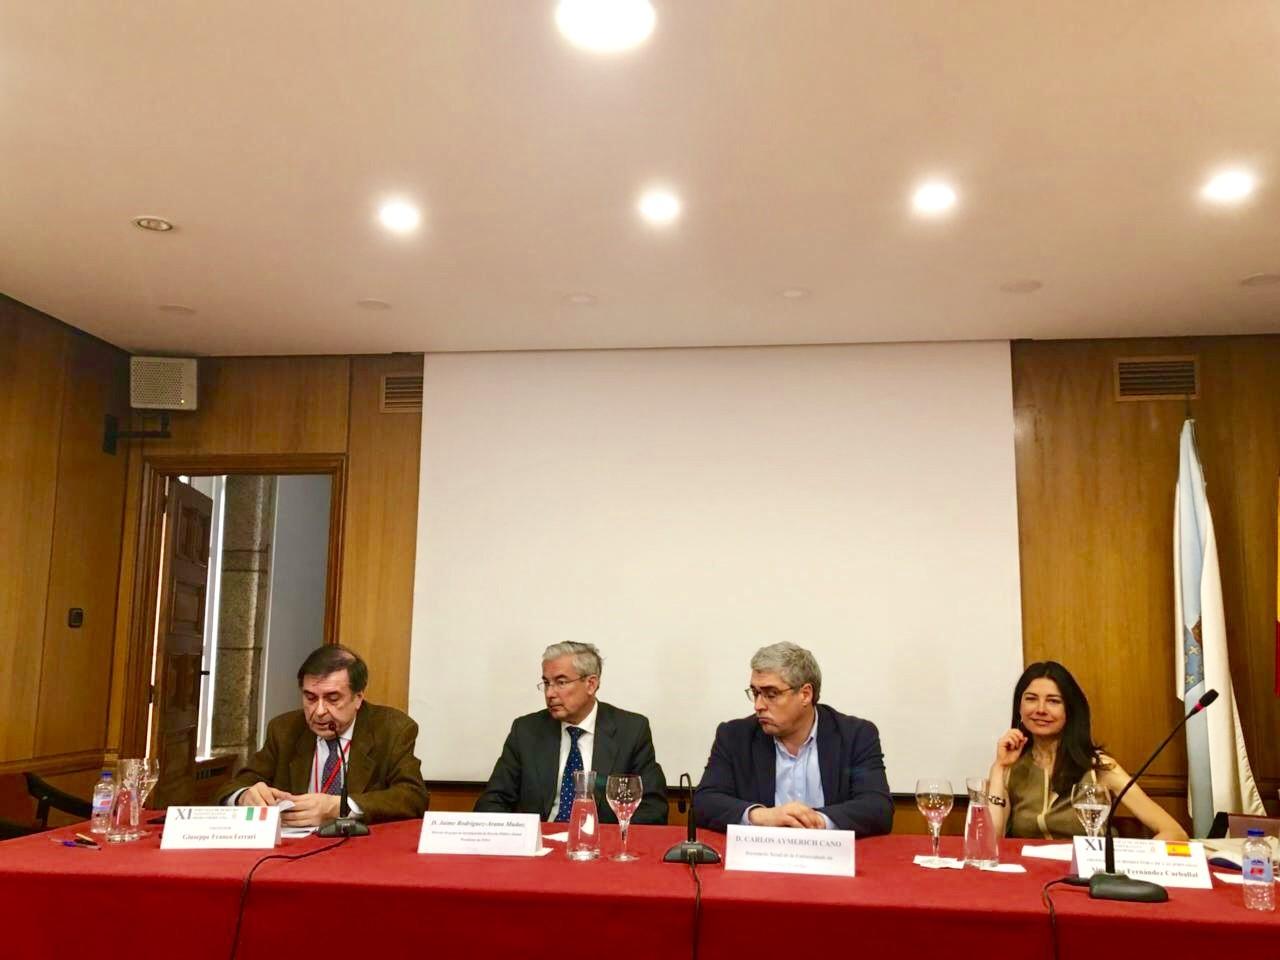 Clausuradas Las XI Jornadas Iberoamericanas De Derecho Administrativo